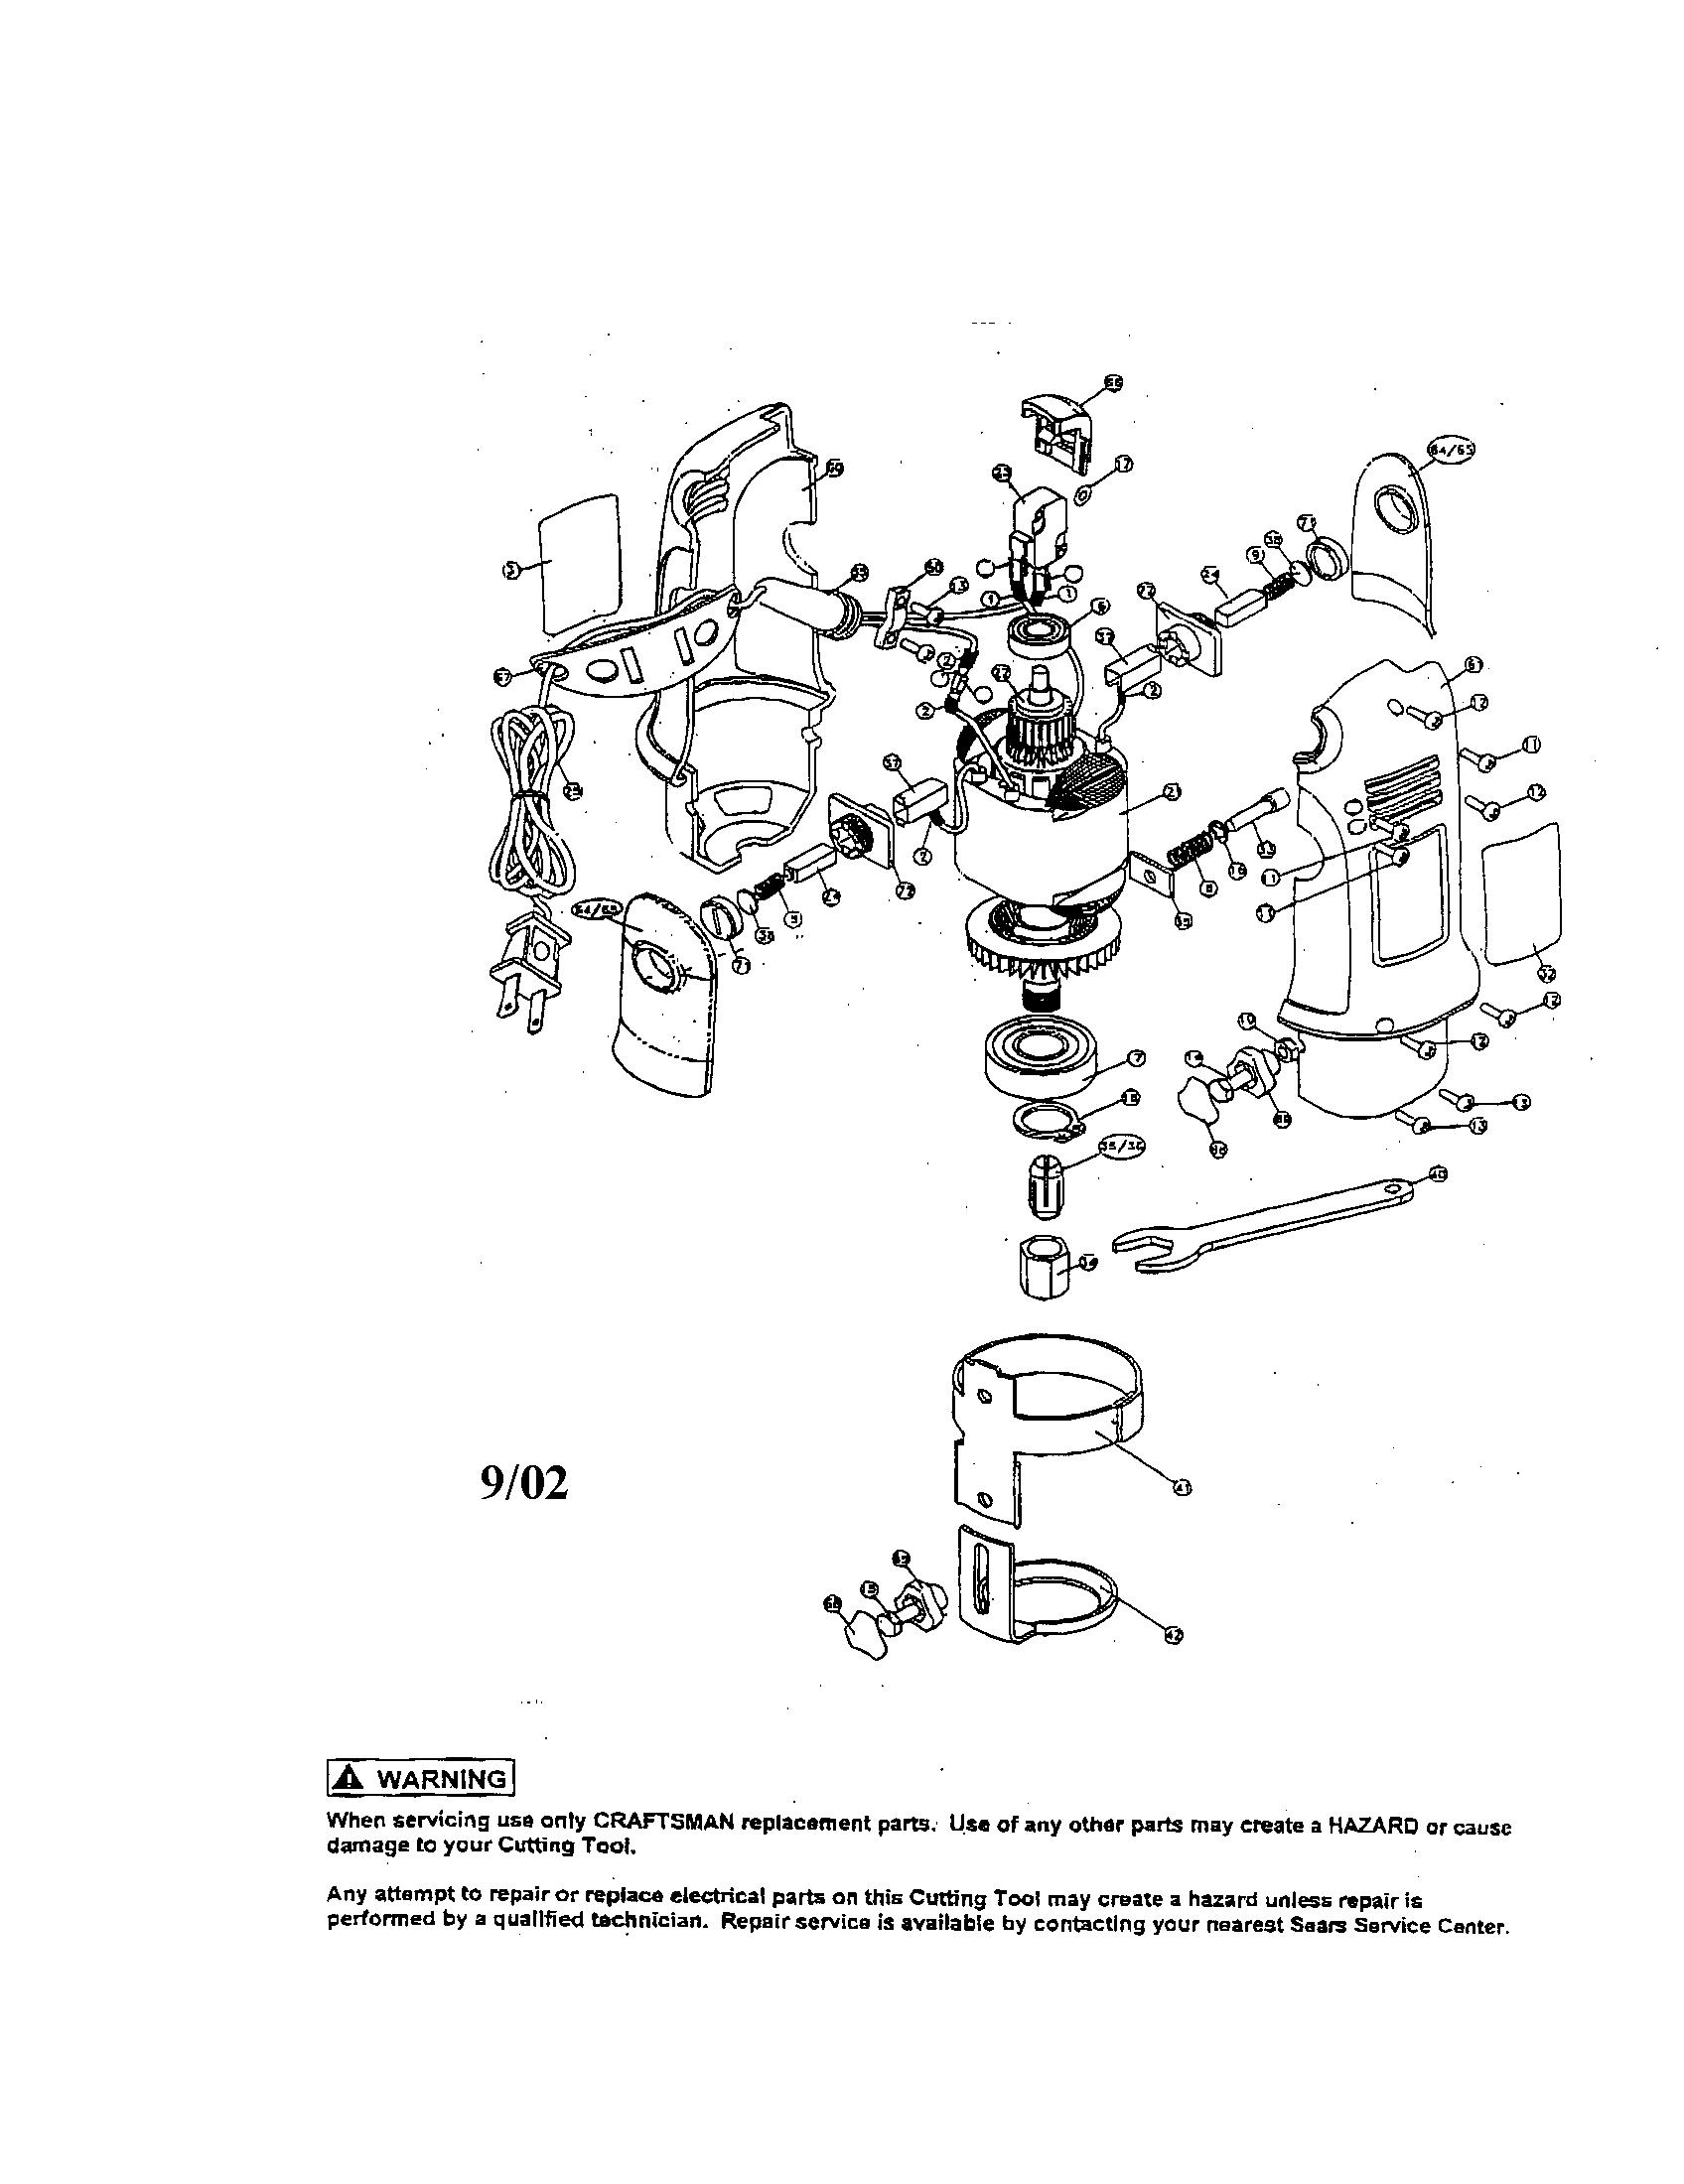 Craftsman model 183172500 router genuine parts